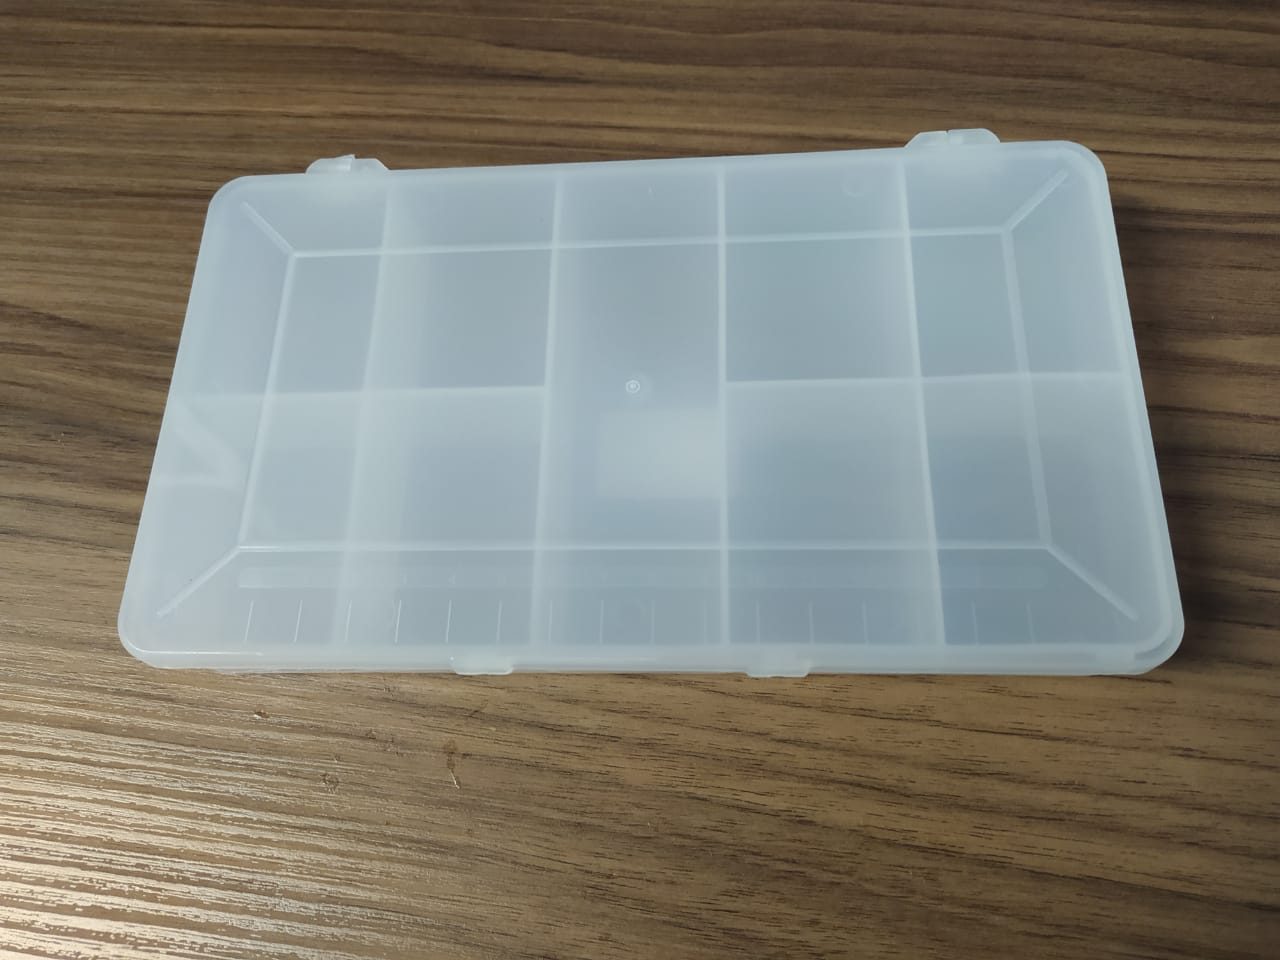 Estojo Plástico Multiuso Transparente pequeno